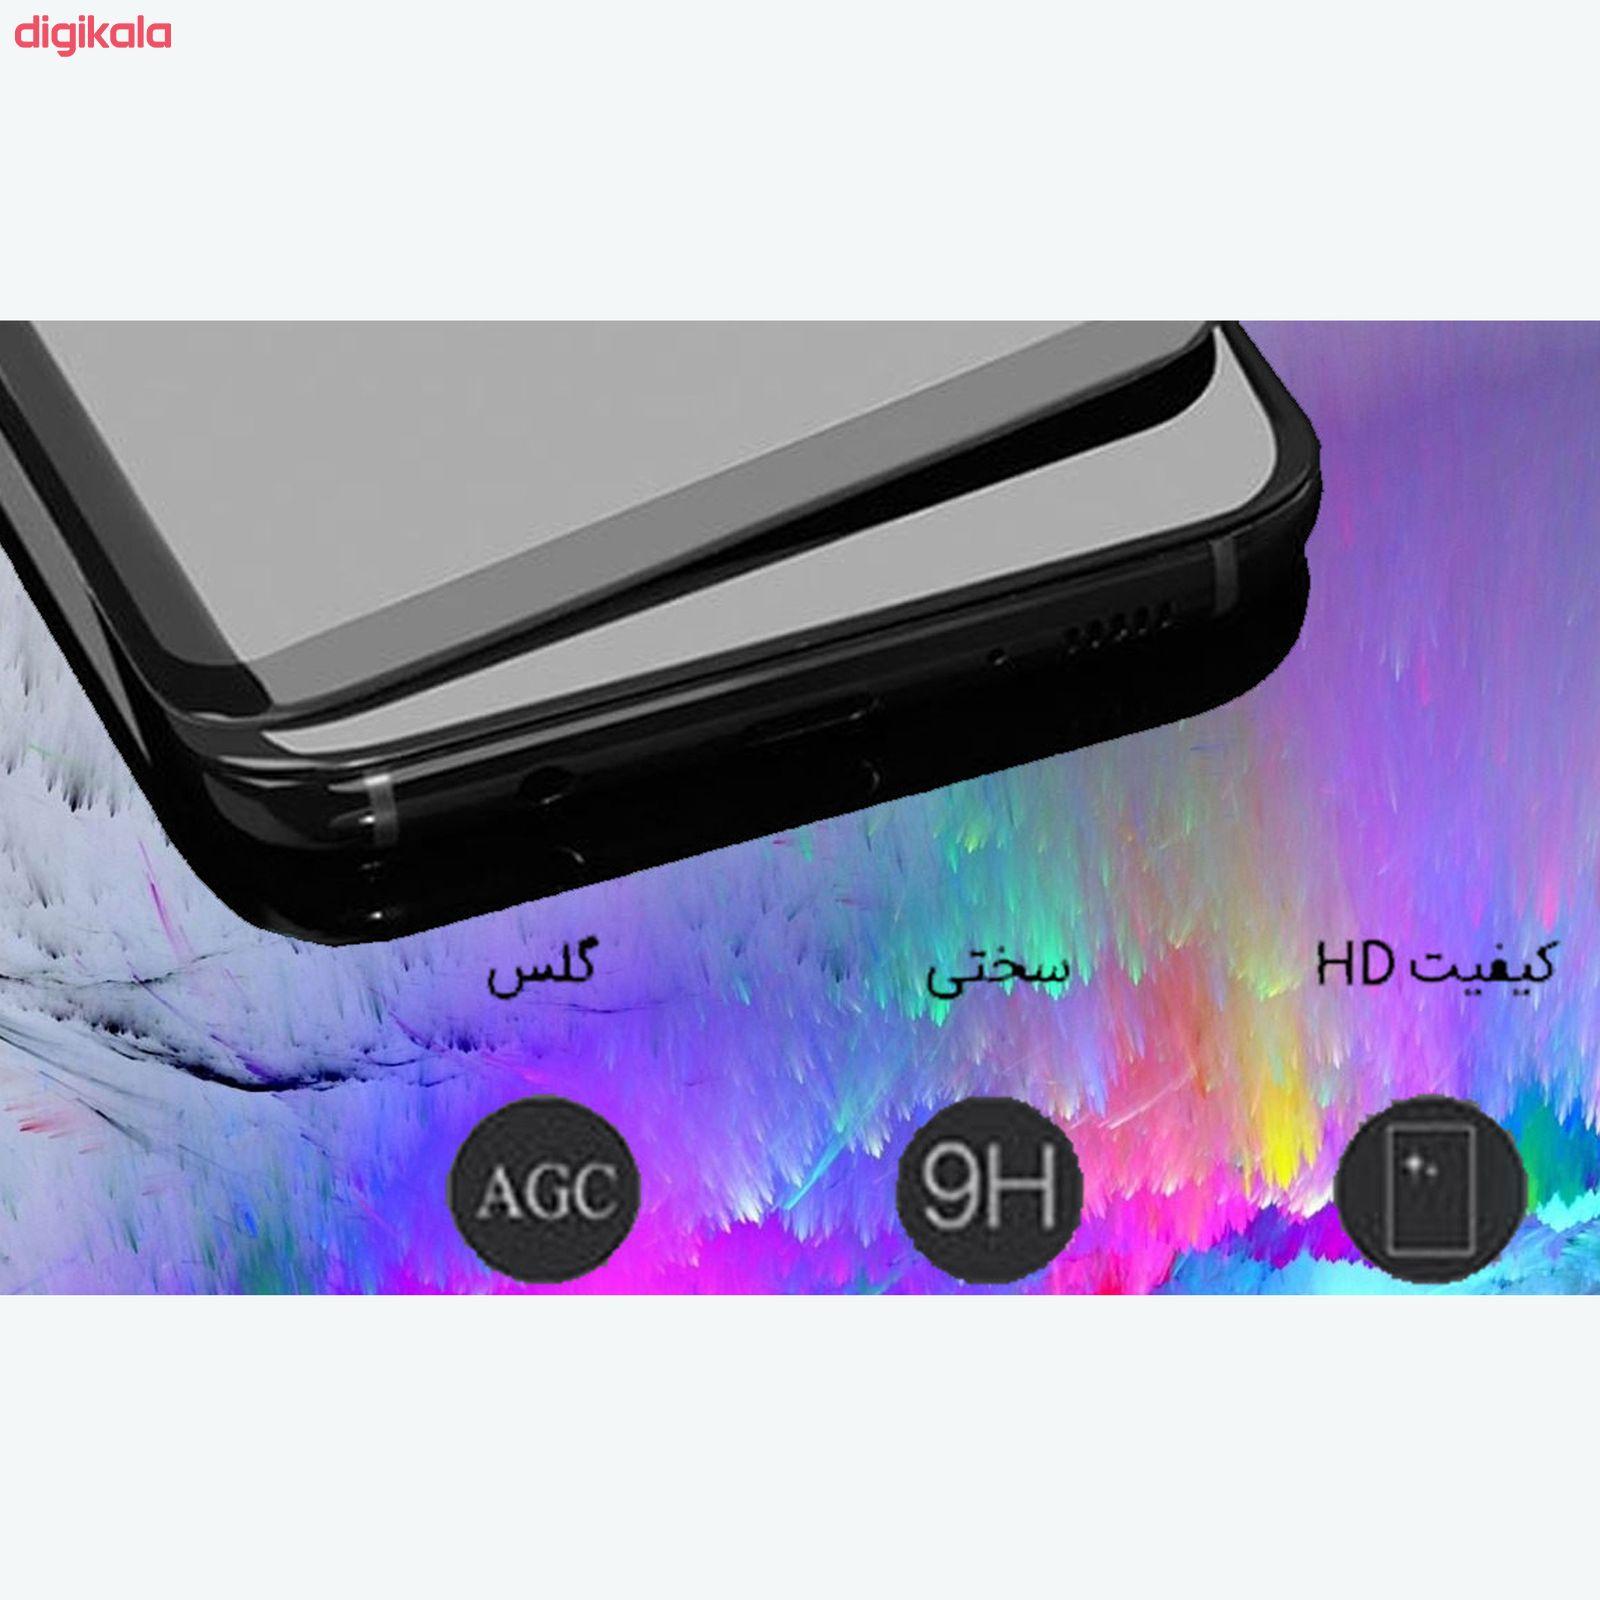 محافظ صفحه نمايش 5D مدل FGSP مناسب براي گوشي موبايل سامسونگ Galaxy A21s main 1 2